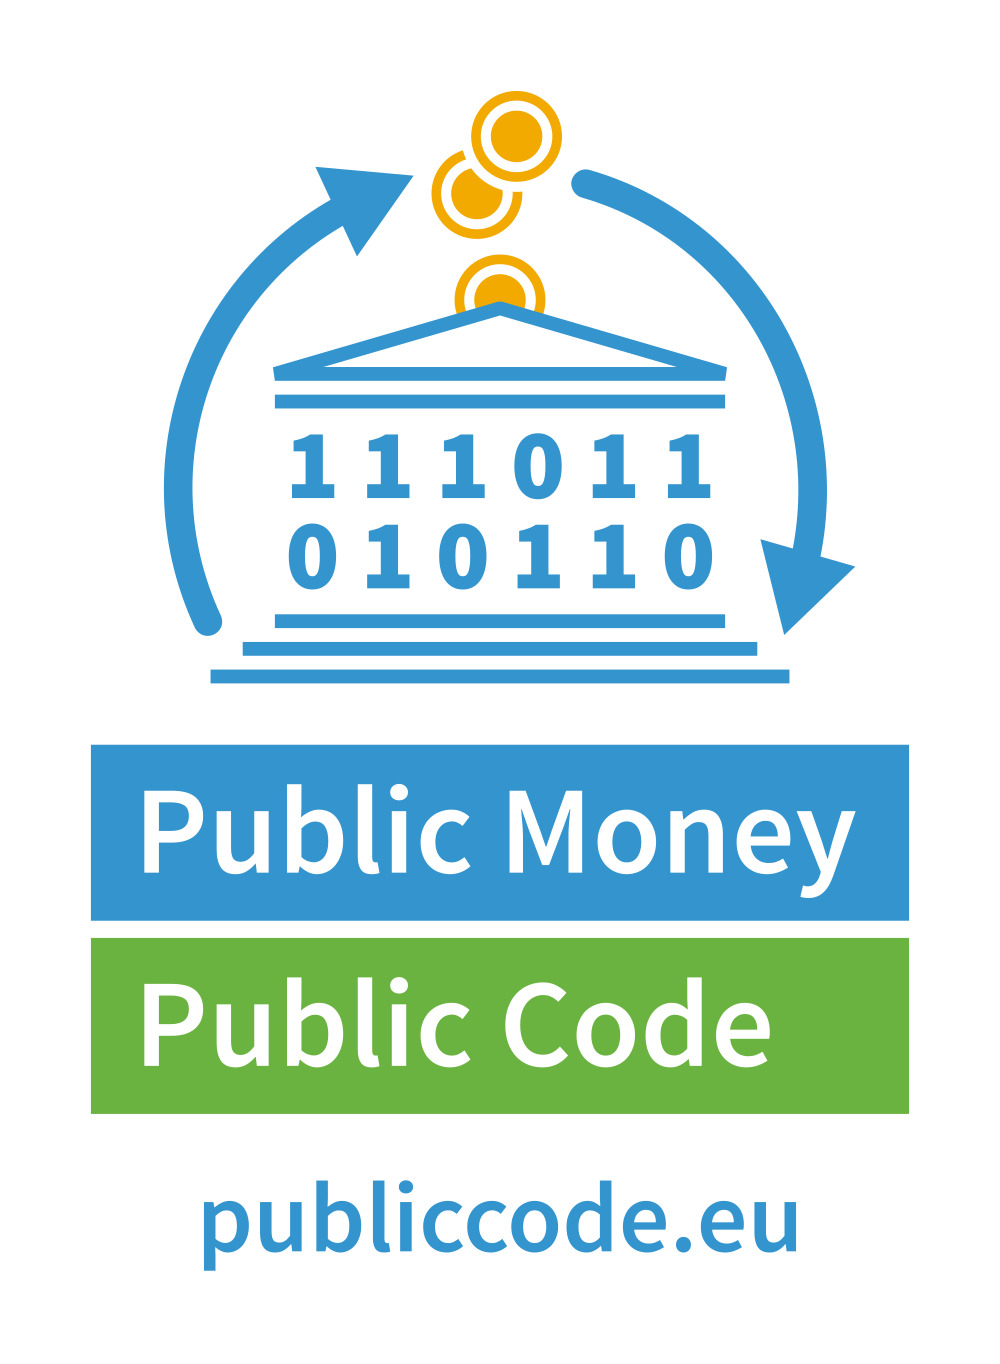 Pmpc logo full